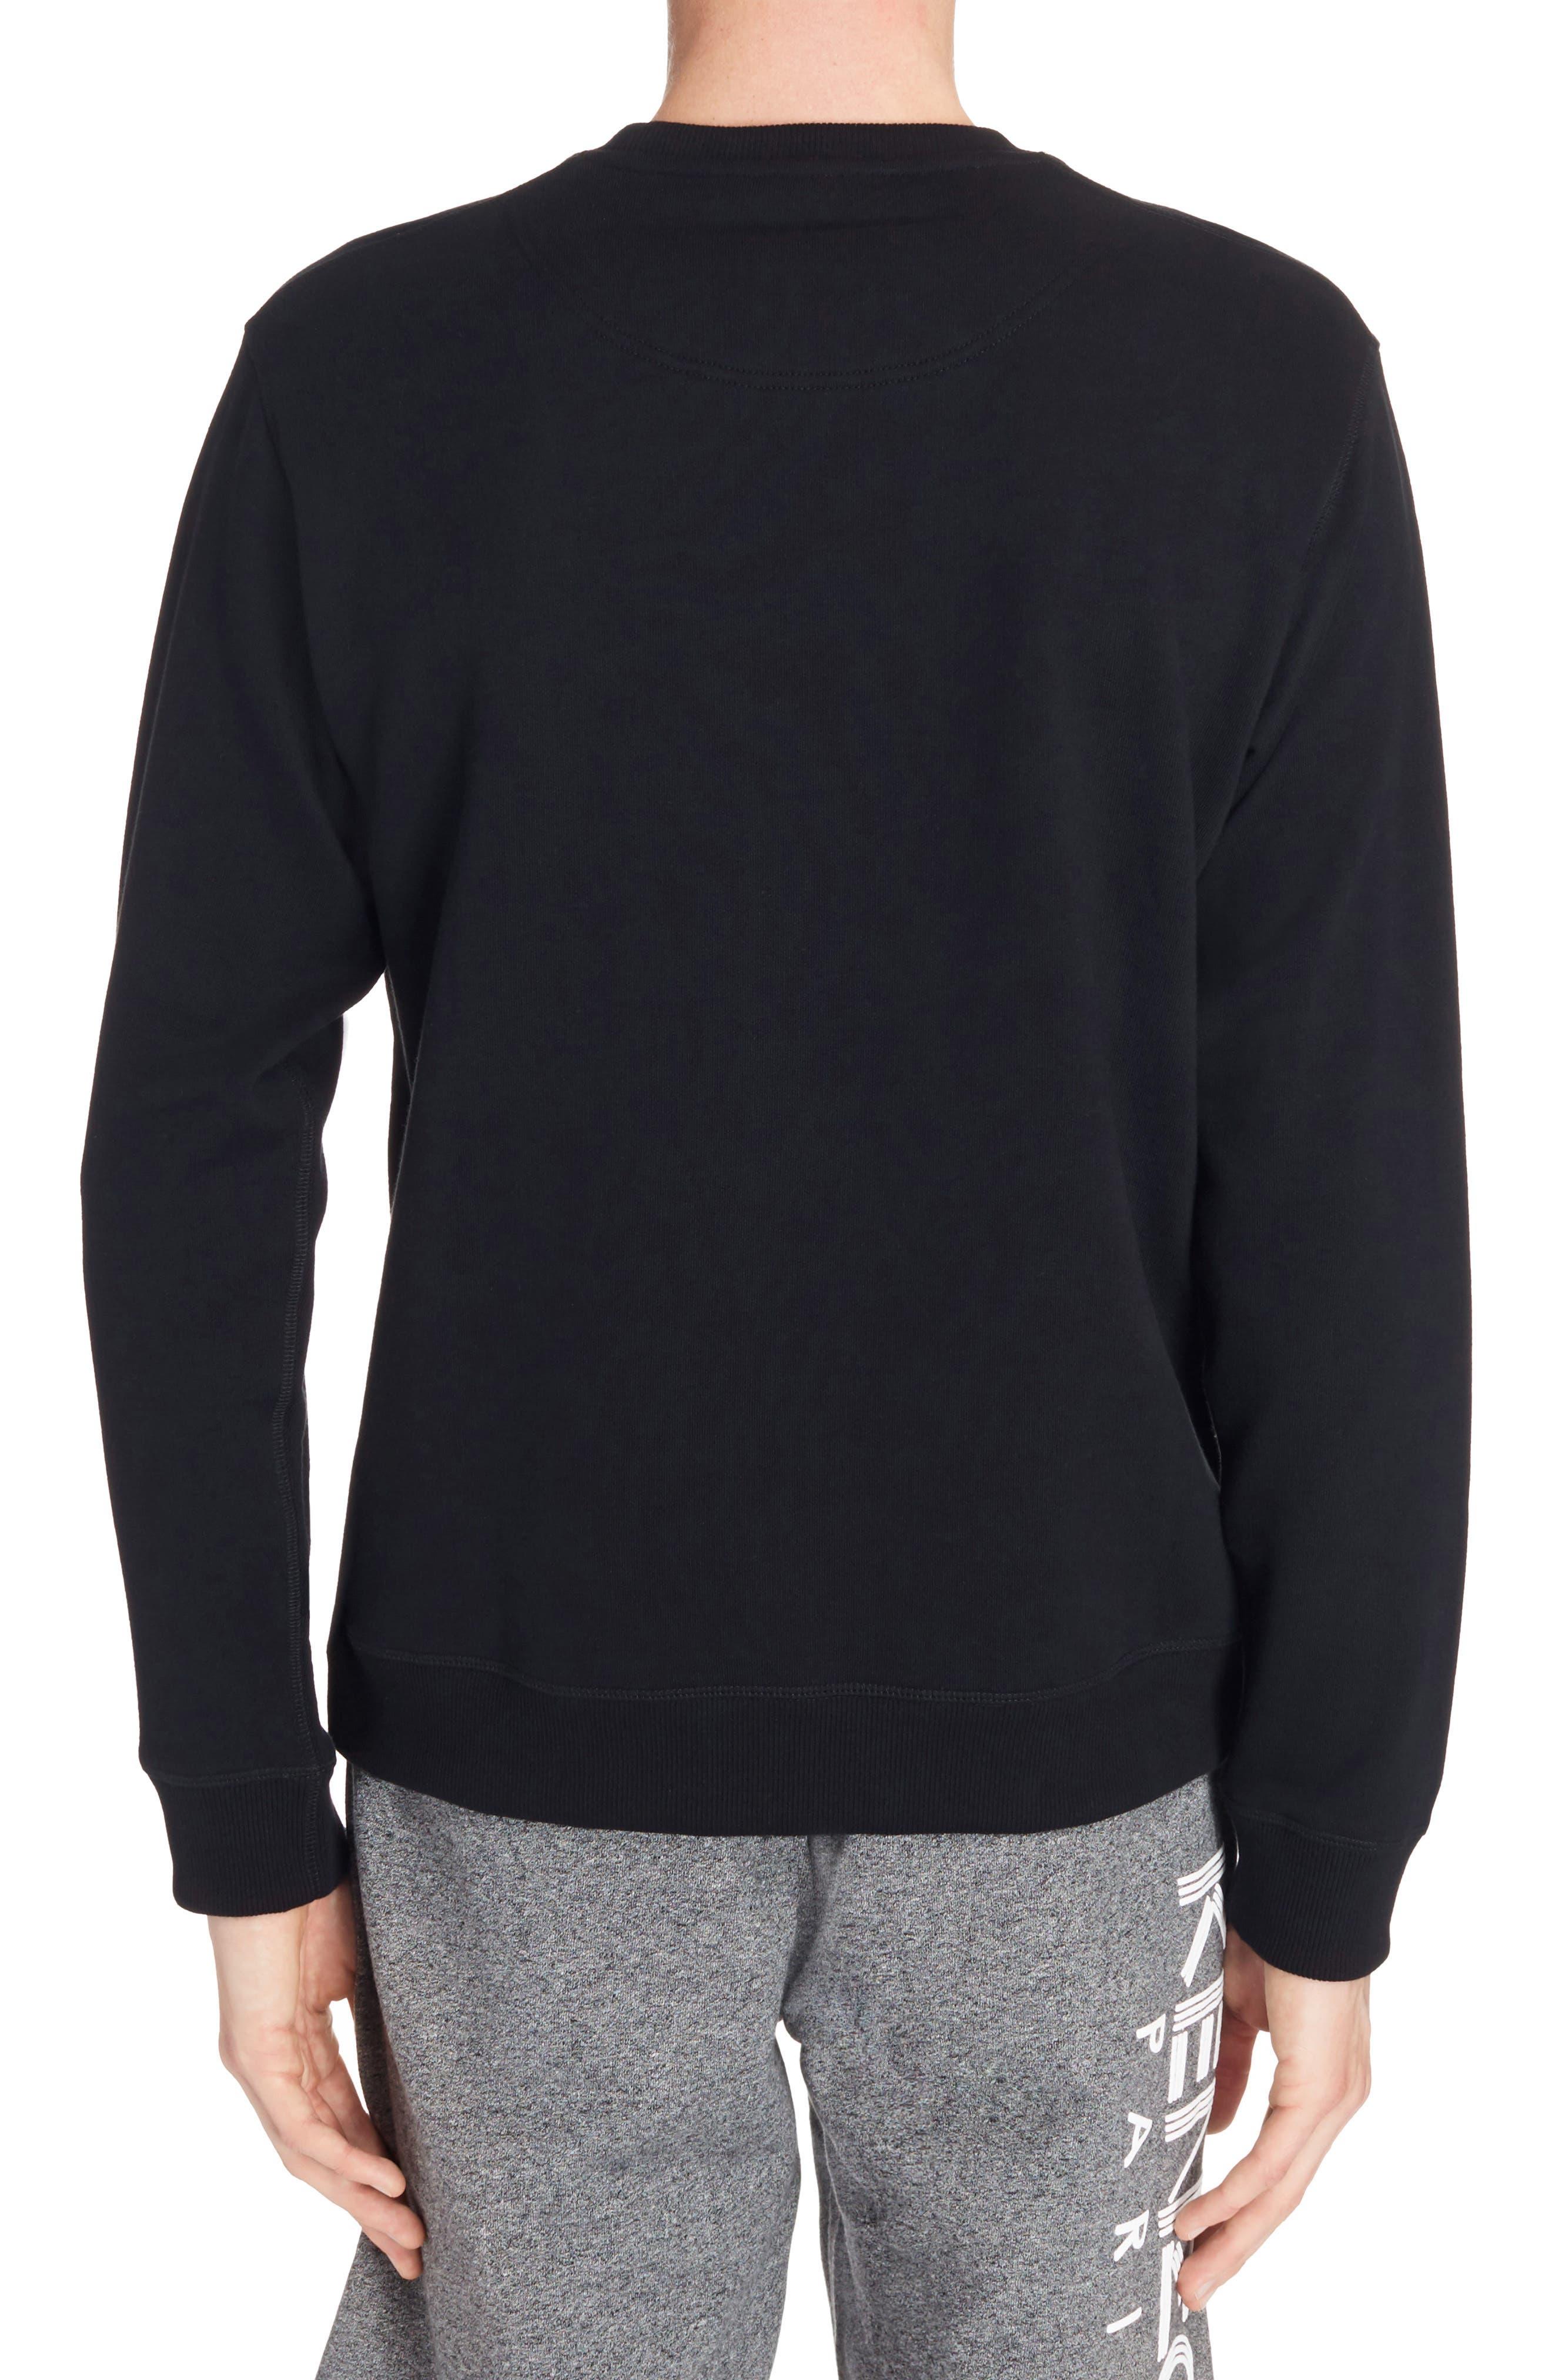 Embroidered Eye Sweatshirt,                             Alternate thumbnail 2, color,                             Black